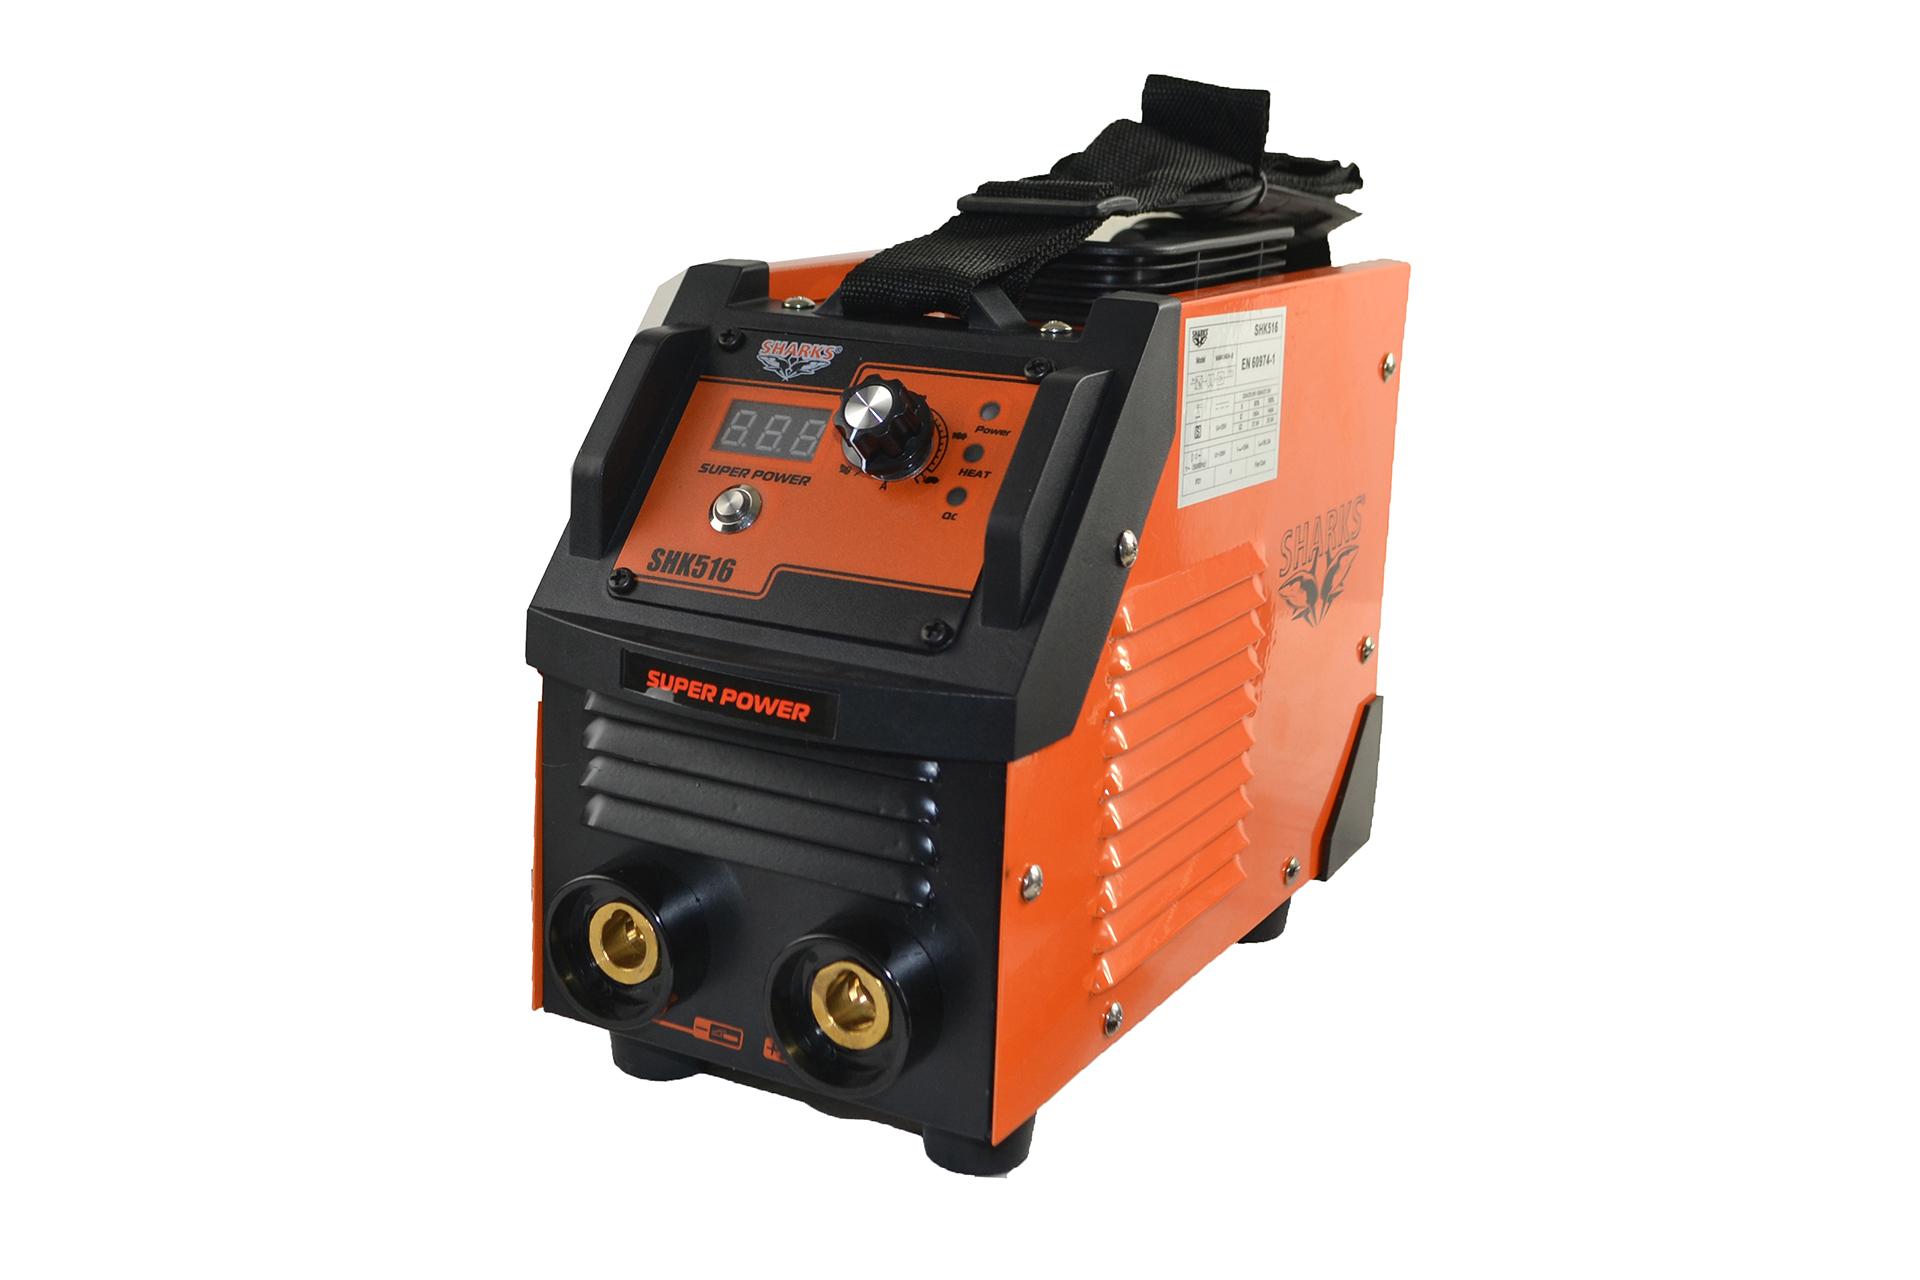 Zvárací invertor Sharks Super power IGBT 190A